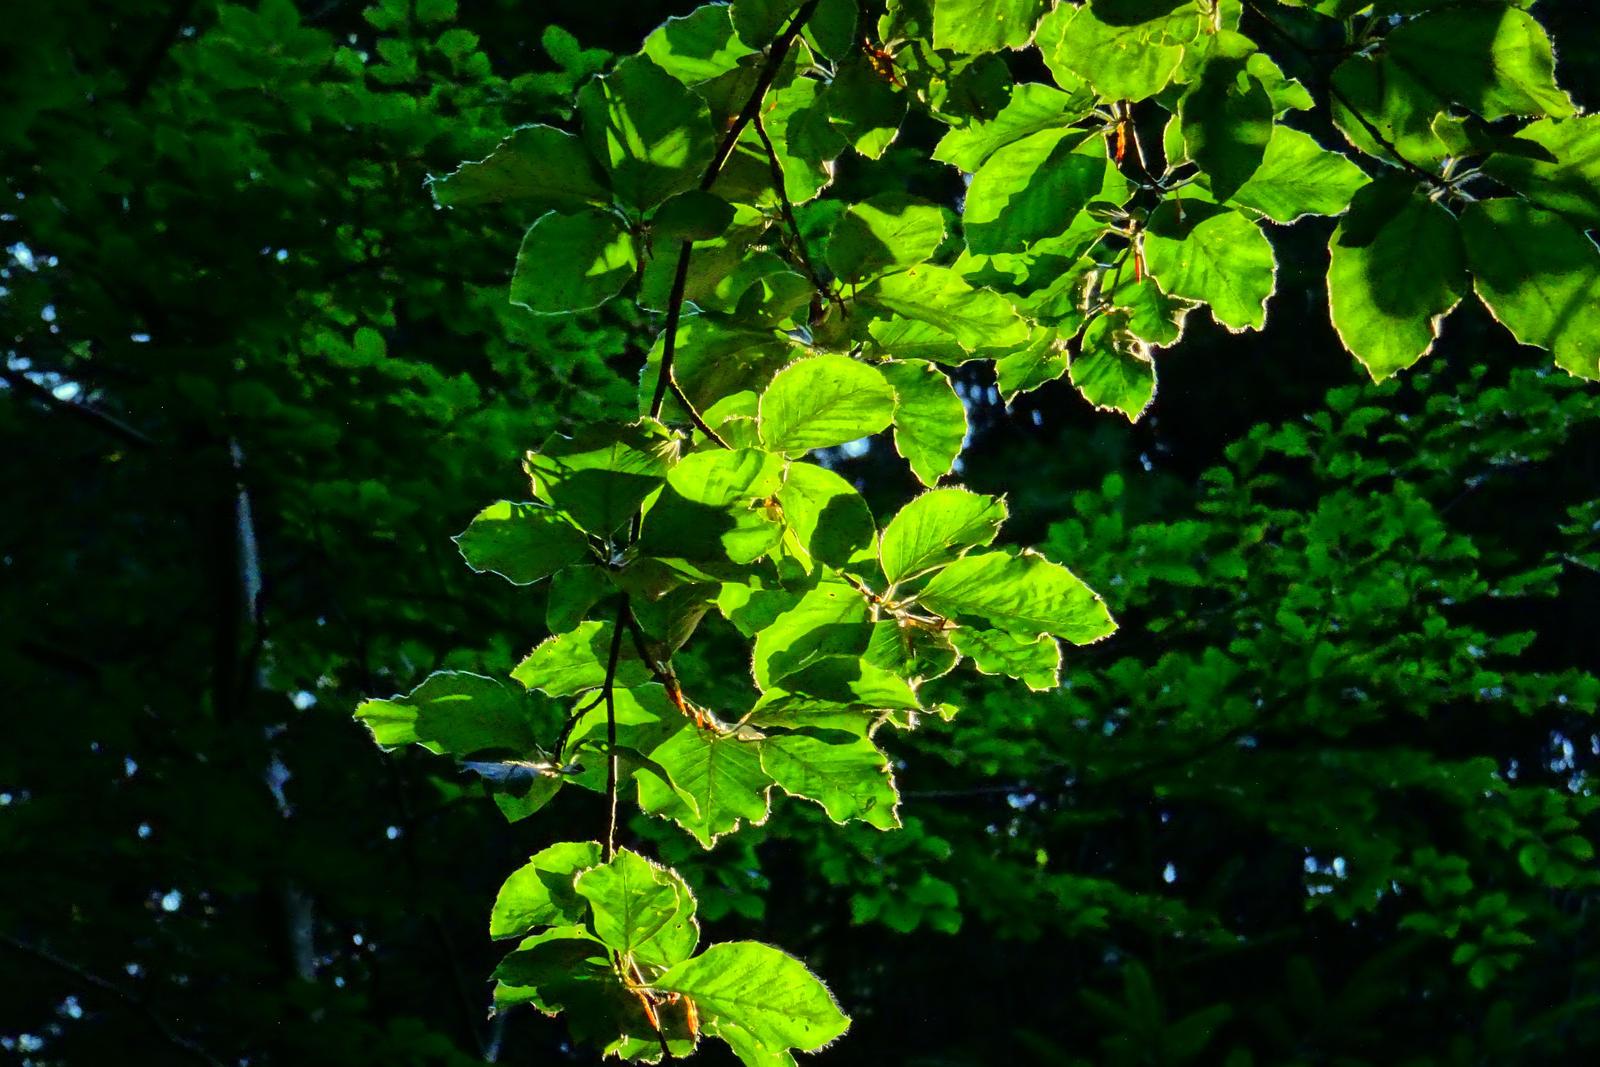 beech leaves by Mittelfranke